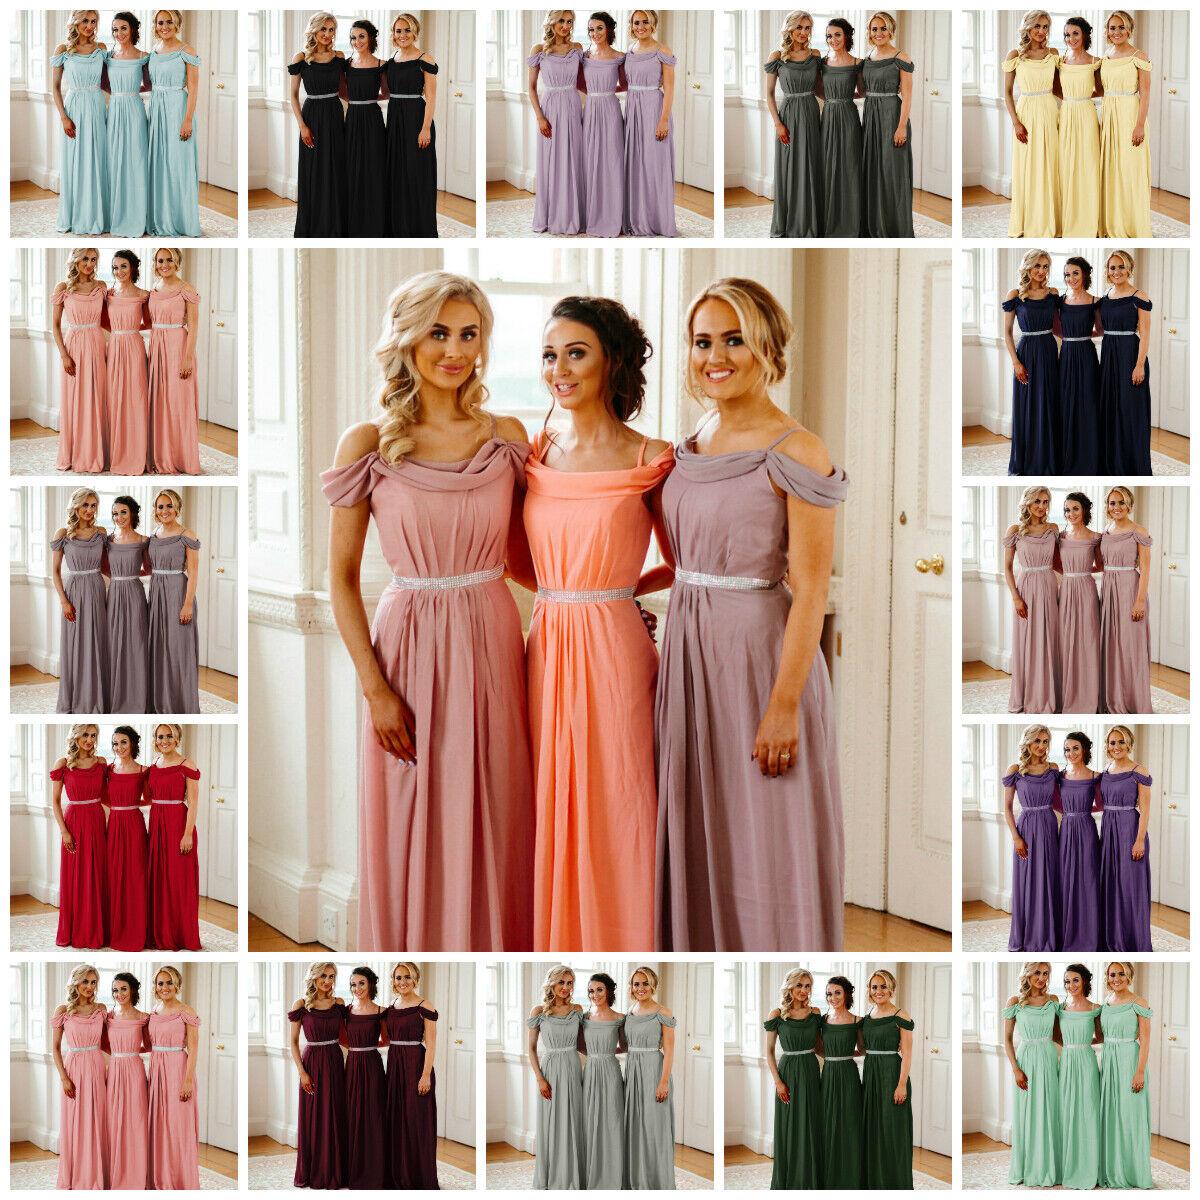 New Chiffon Cowell Bridesmaid Dress Diamante A-line Wedding Party Ballgown